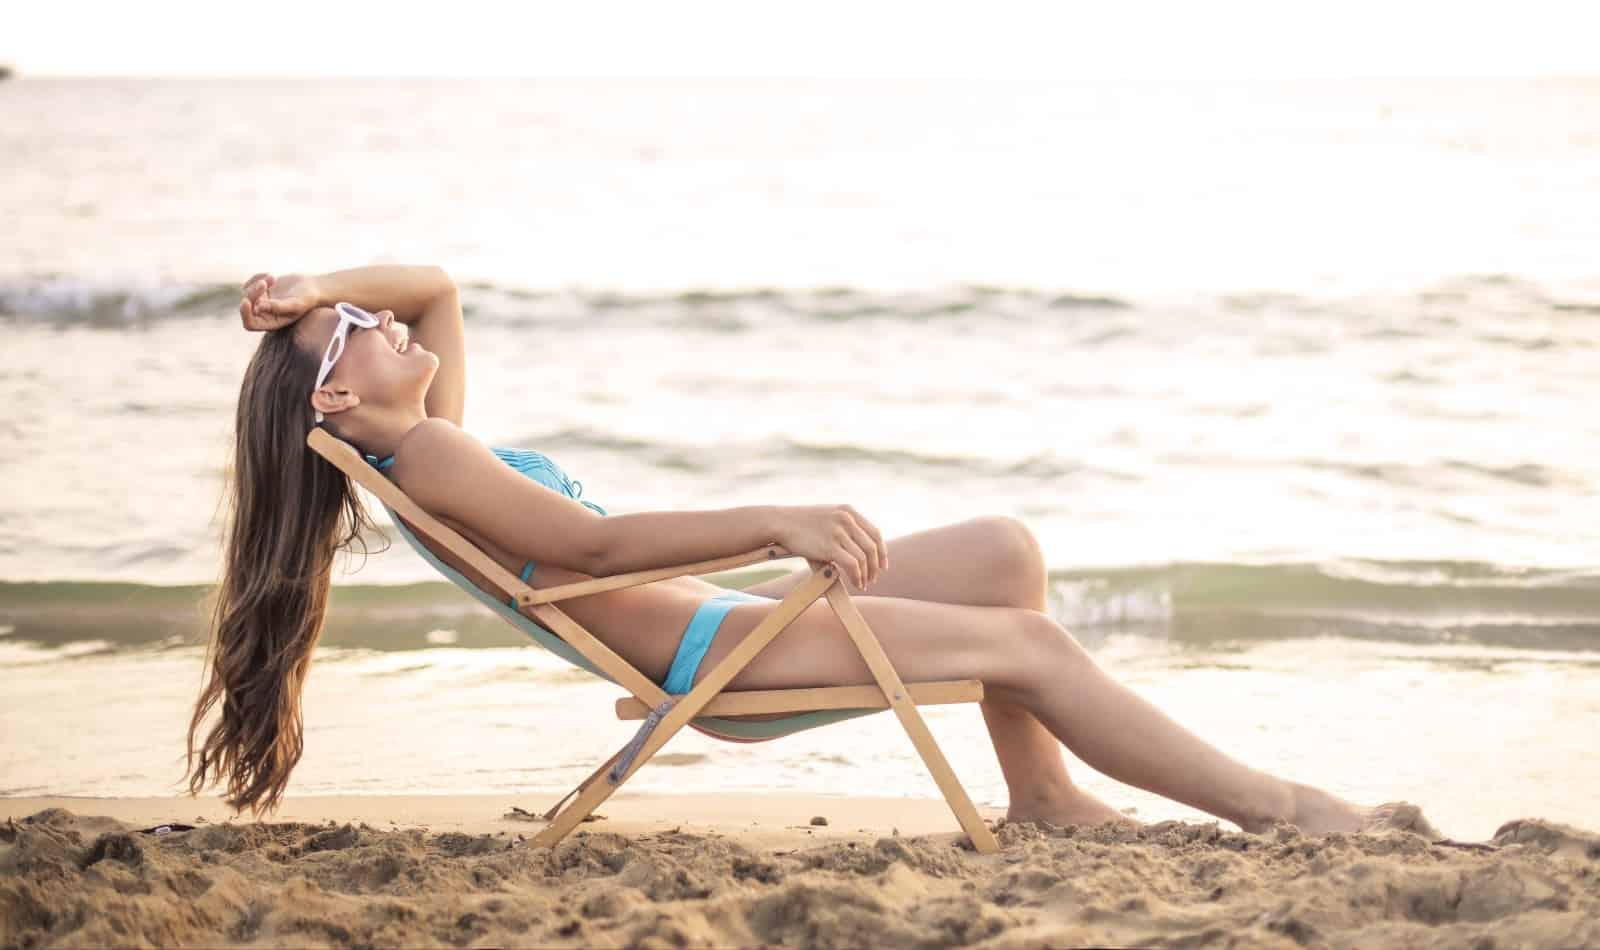 a woman in a blue bikini tanning on the beach